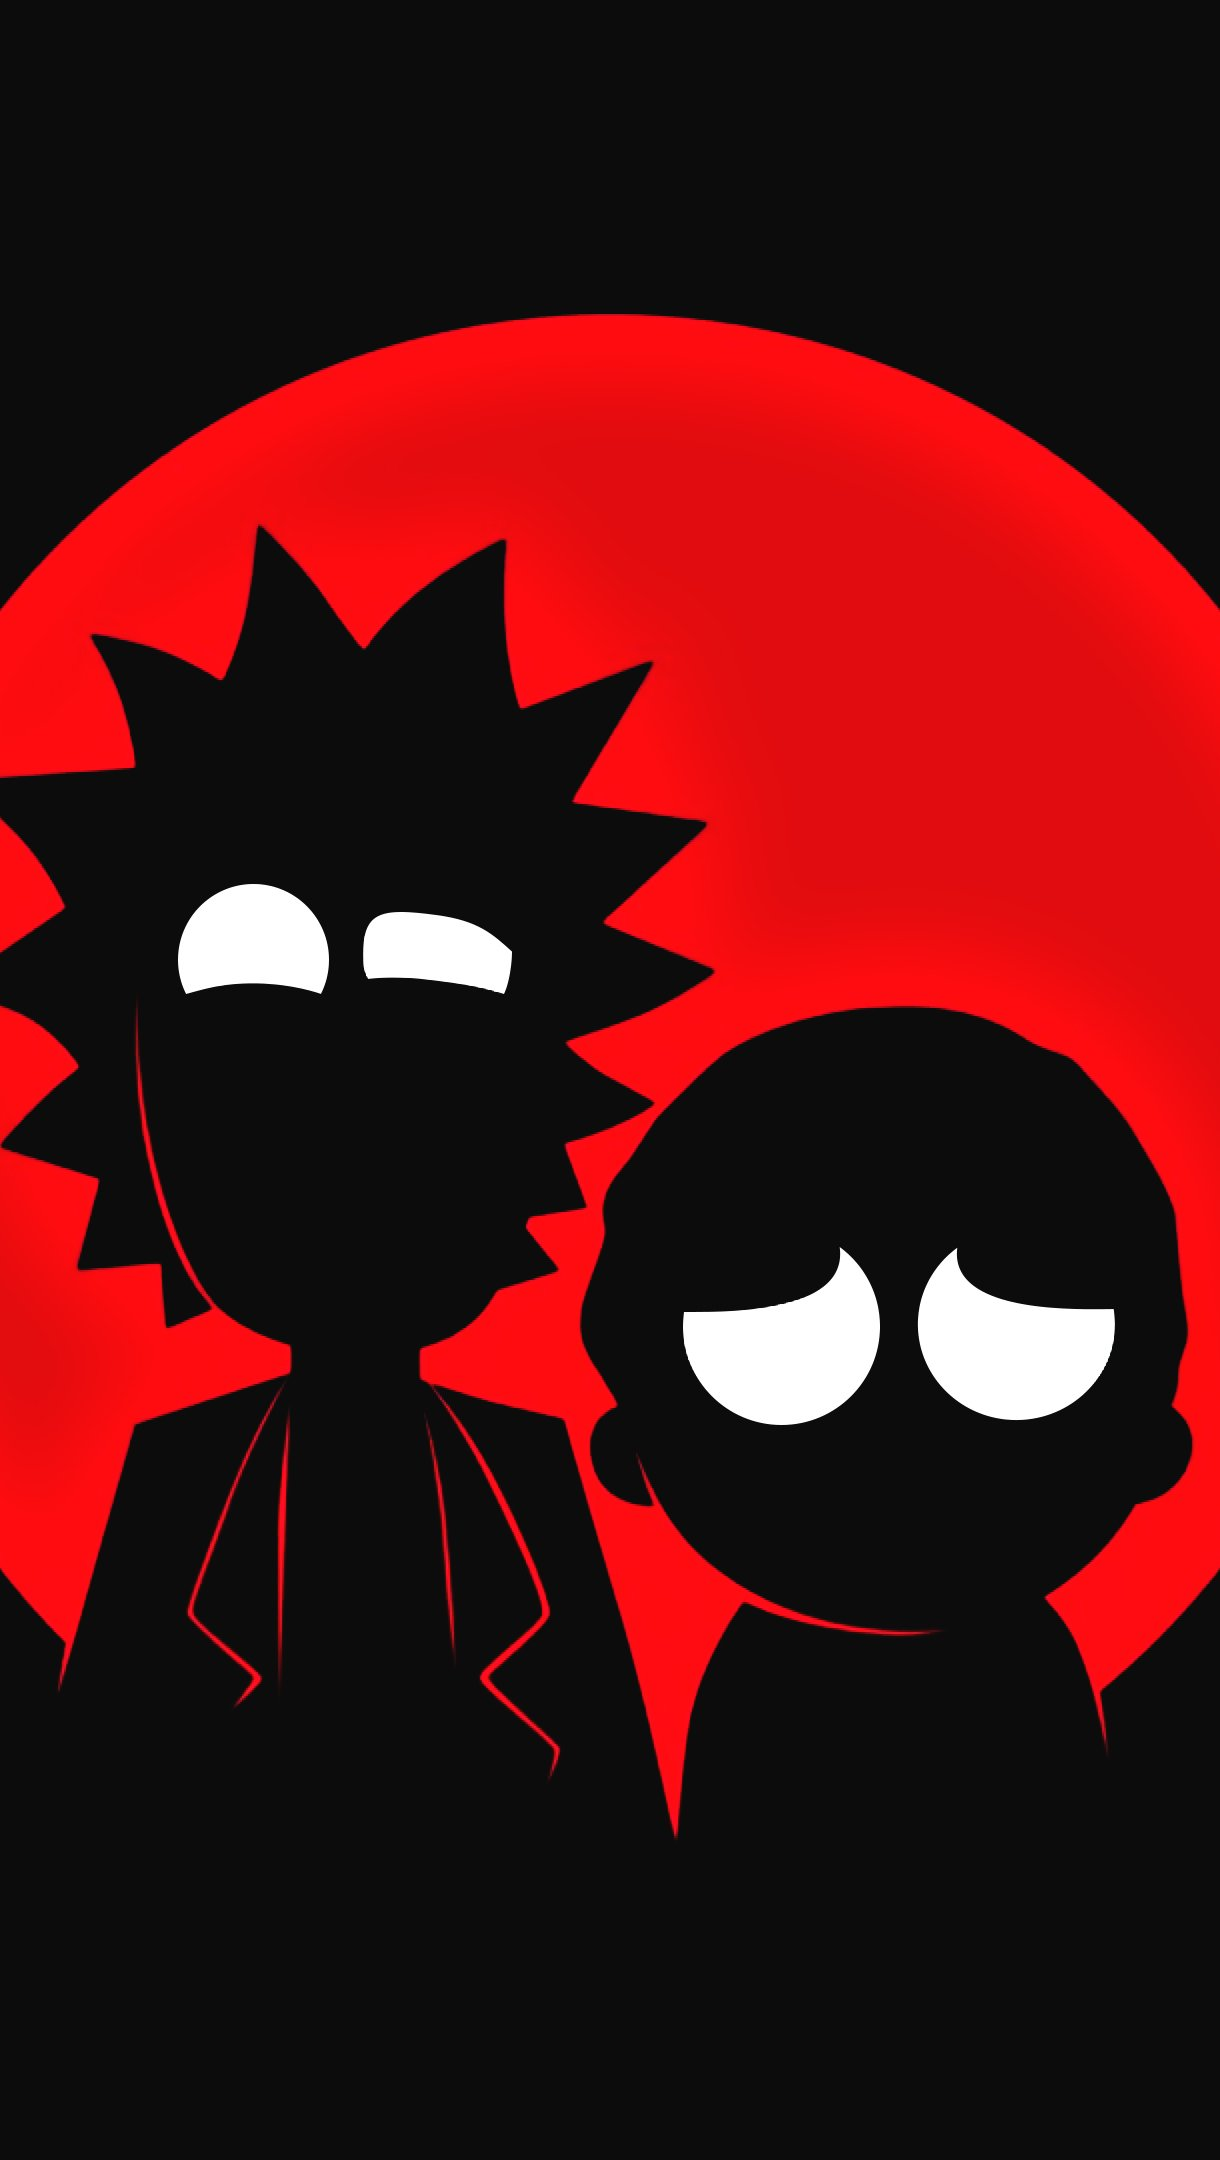 Fondos de pantalla Rick and Morty Minimalista Vertical